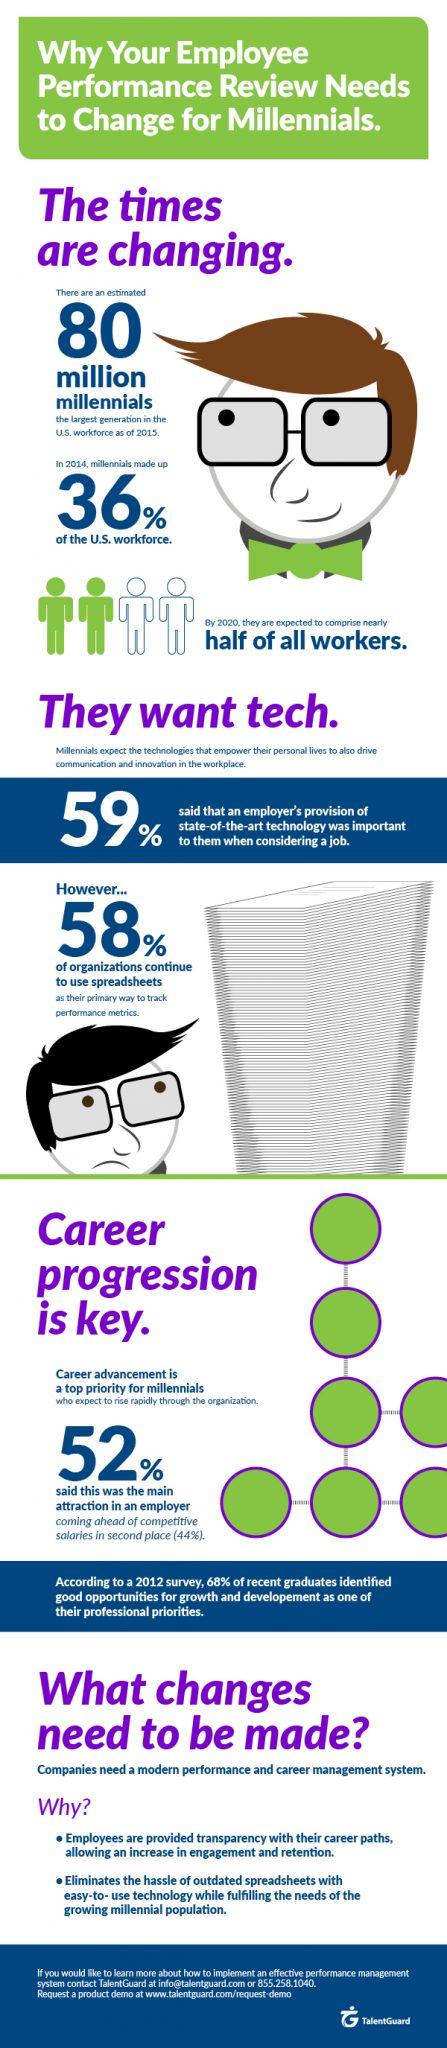 Millennial Performance Management Infographic